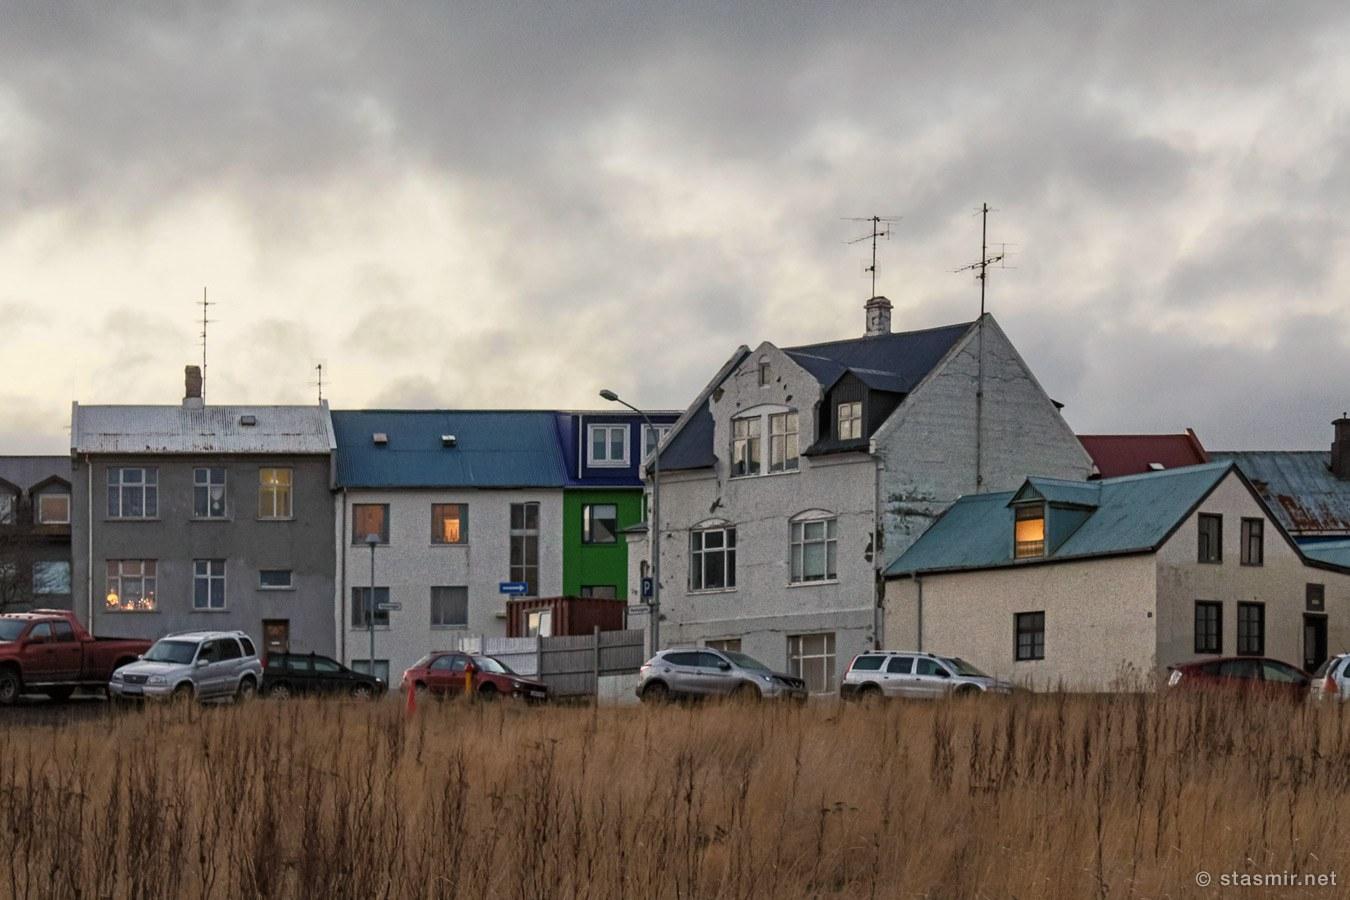 Iceland, Reykjavík, Vesturbær, Западный Рейкьявик, Экскурсия по городу, stasmir, стасмир